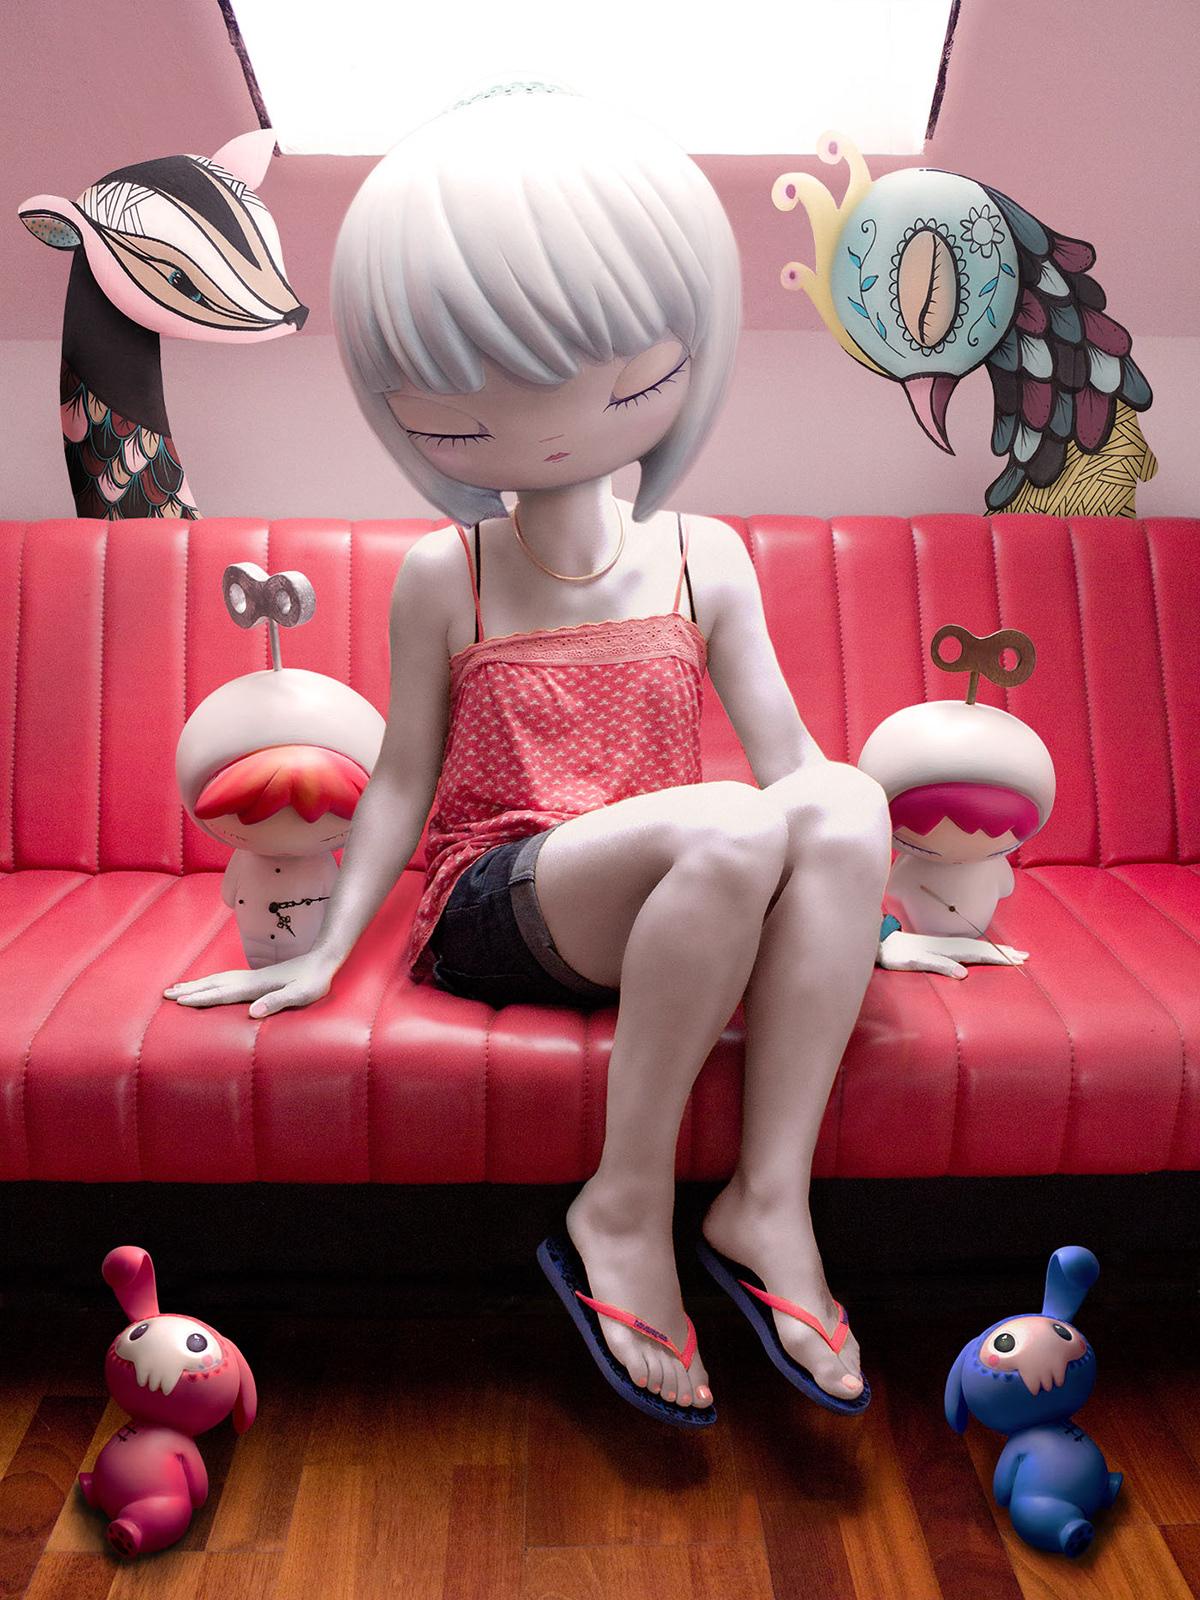 art toys Designer toys emilie steele eric althin Fine Art Dolls Horrible Adorables luke chueh nate van dyke sofubi toy designers